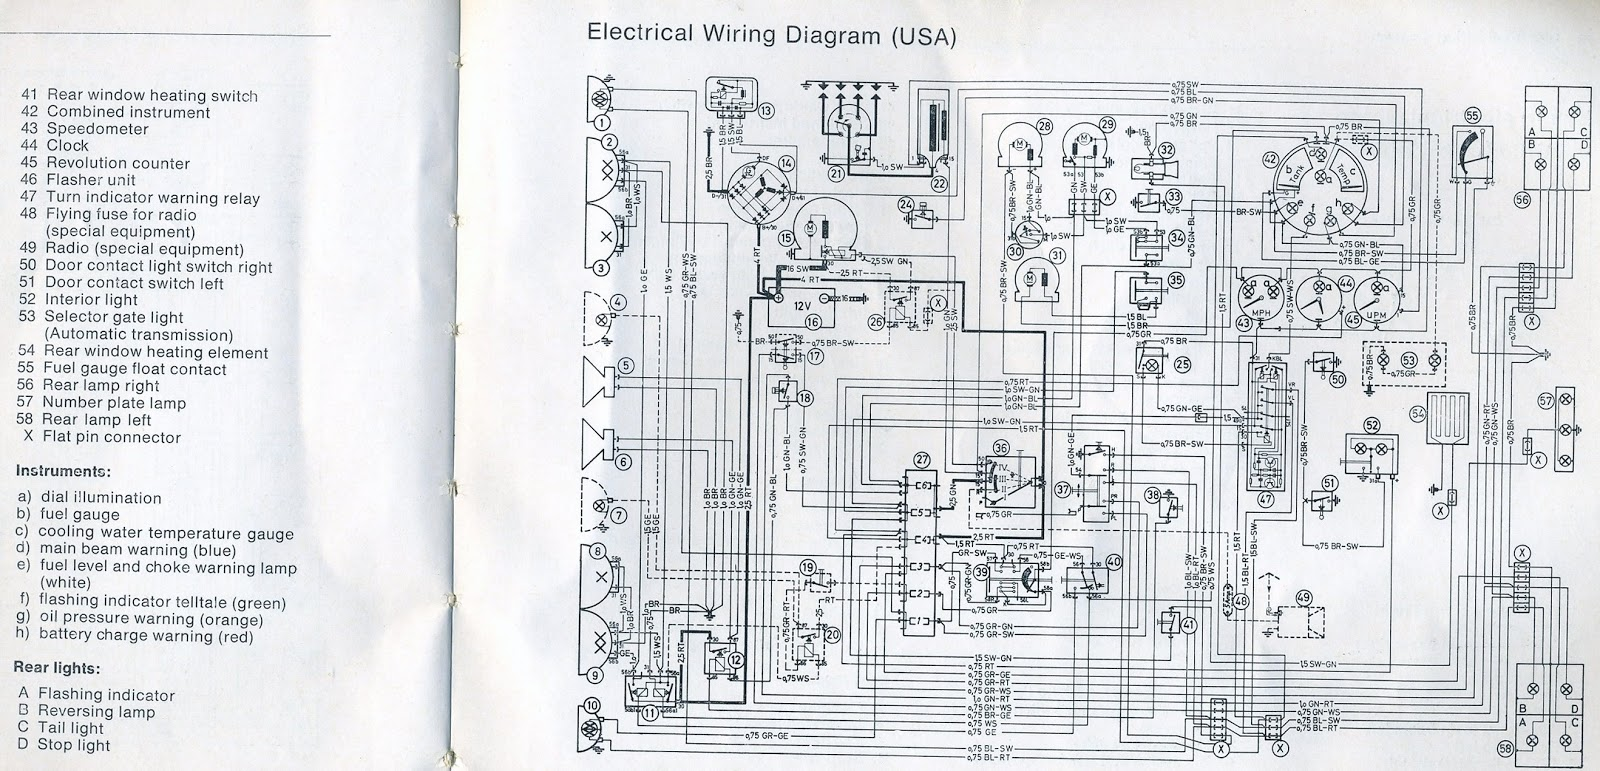 hight resolution of bmw m42 wiring diagram simple wiring schema bmw 535i xdrive wiring diagrams bmw m42 wiring diagram